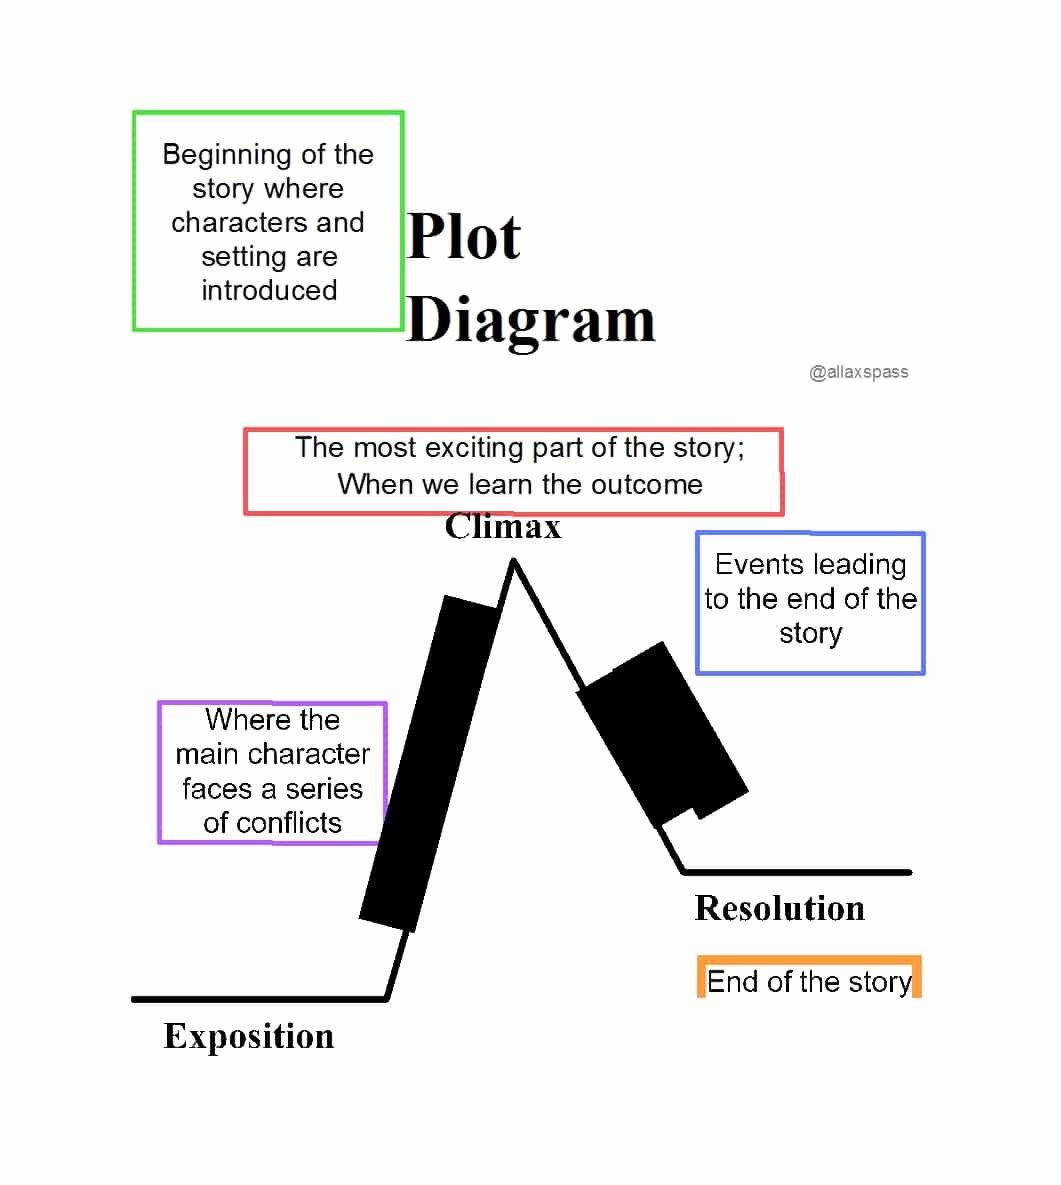 Plot Diagram Template Pdf Luxury 45 Professional Plot Diagram Templates Plot Pyramid